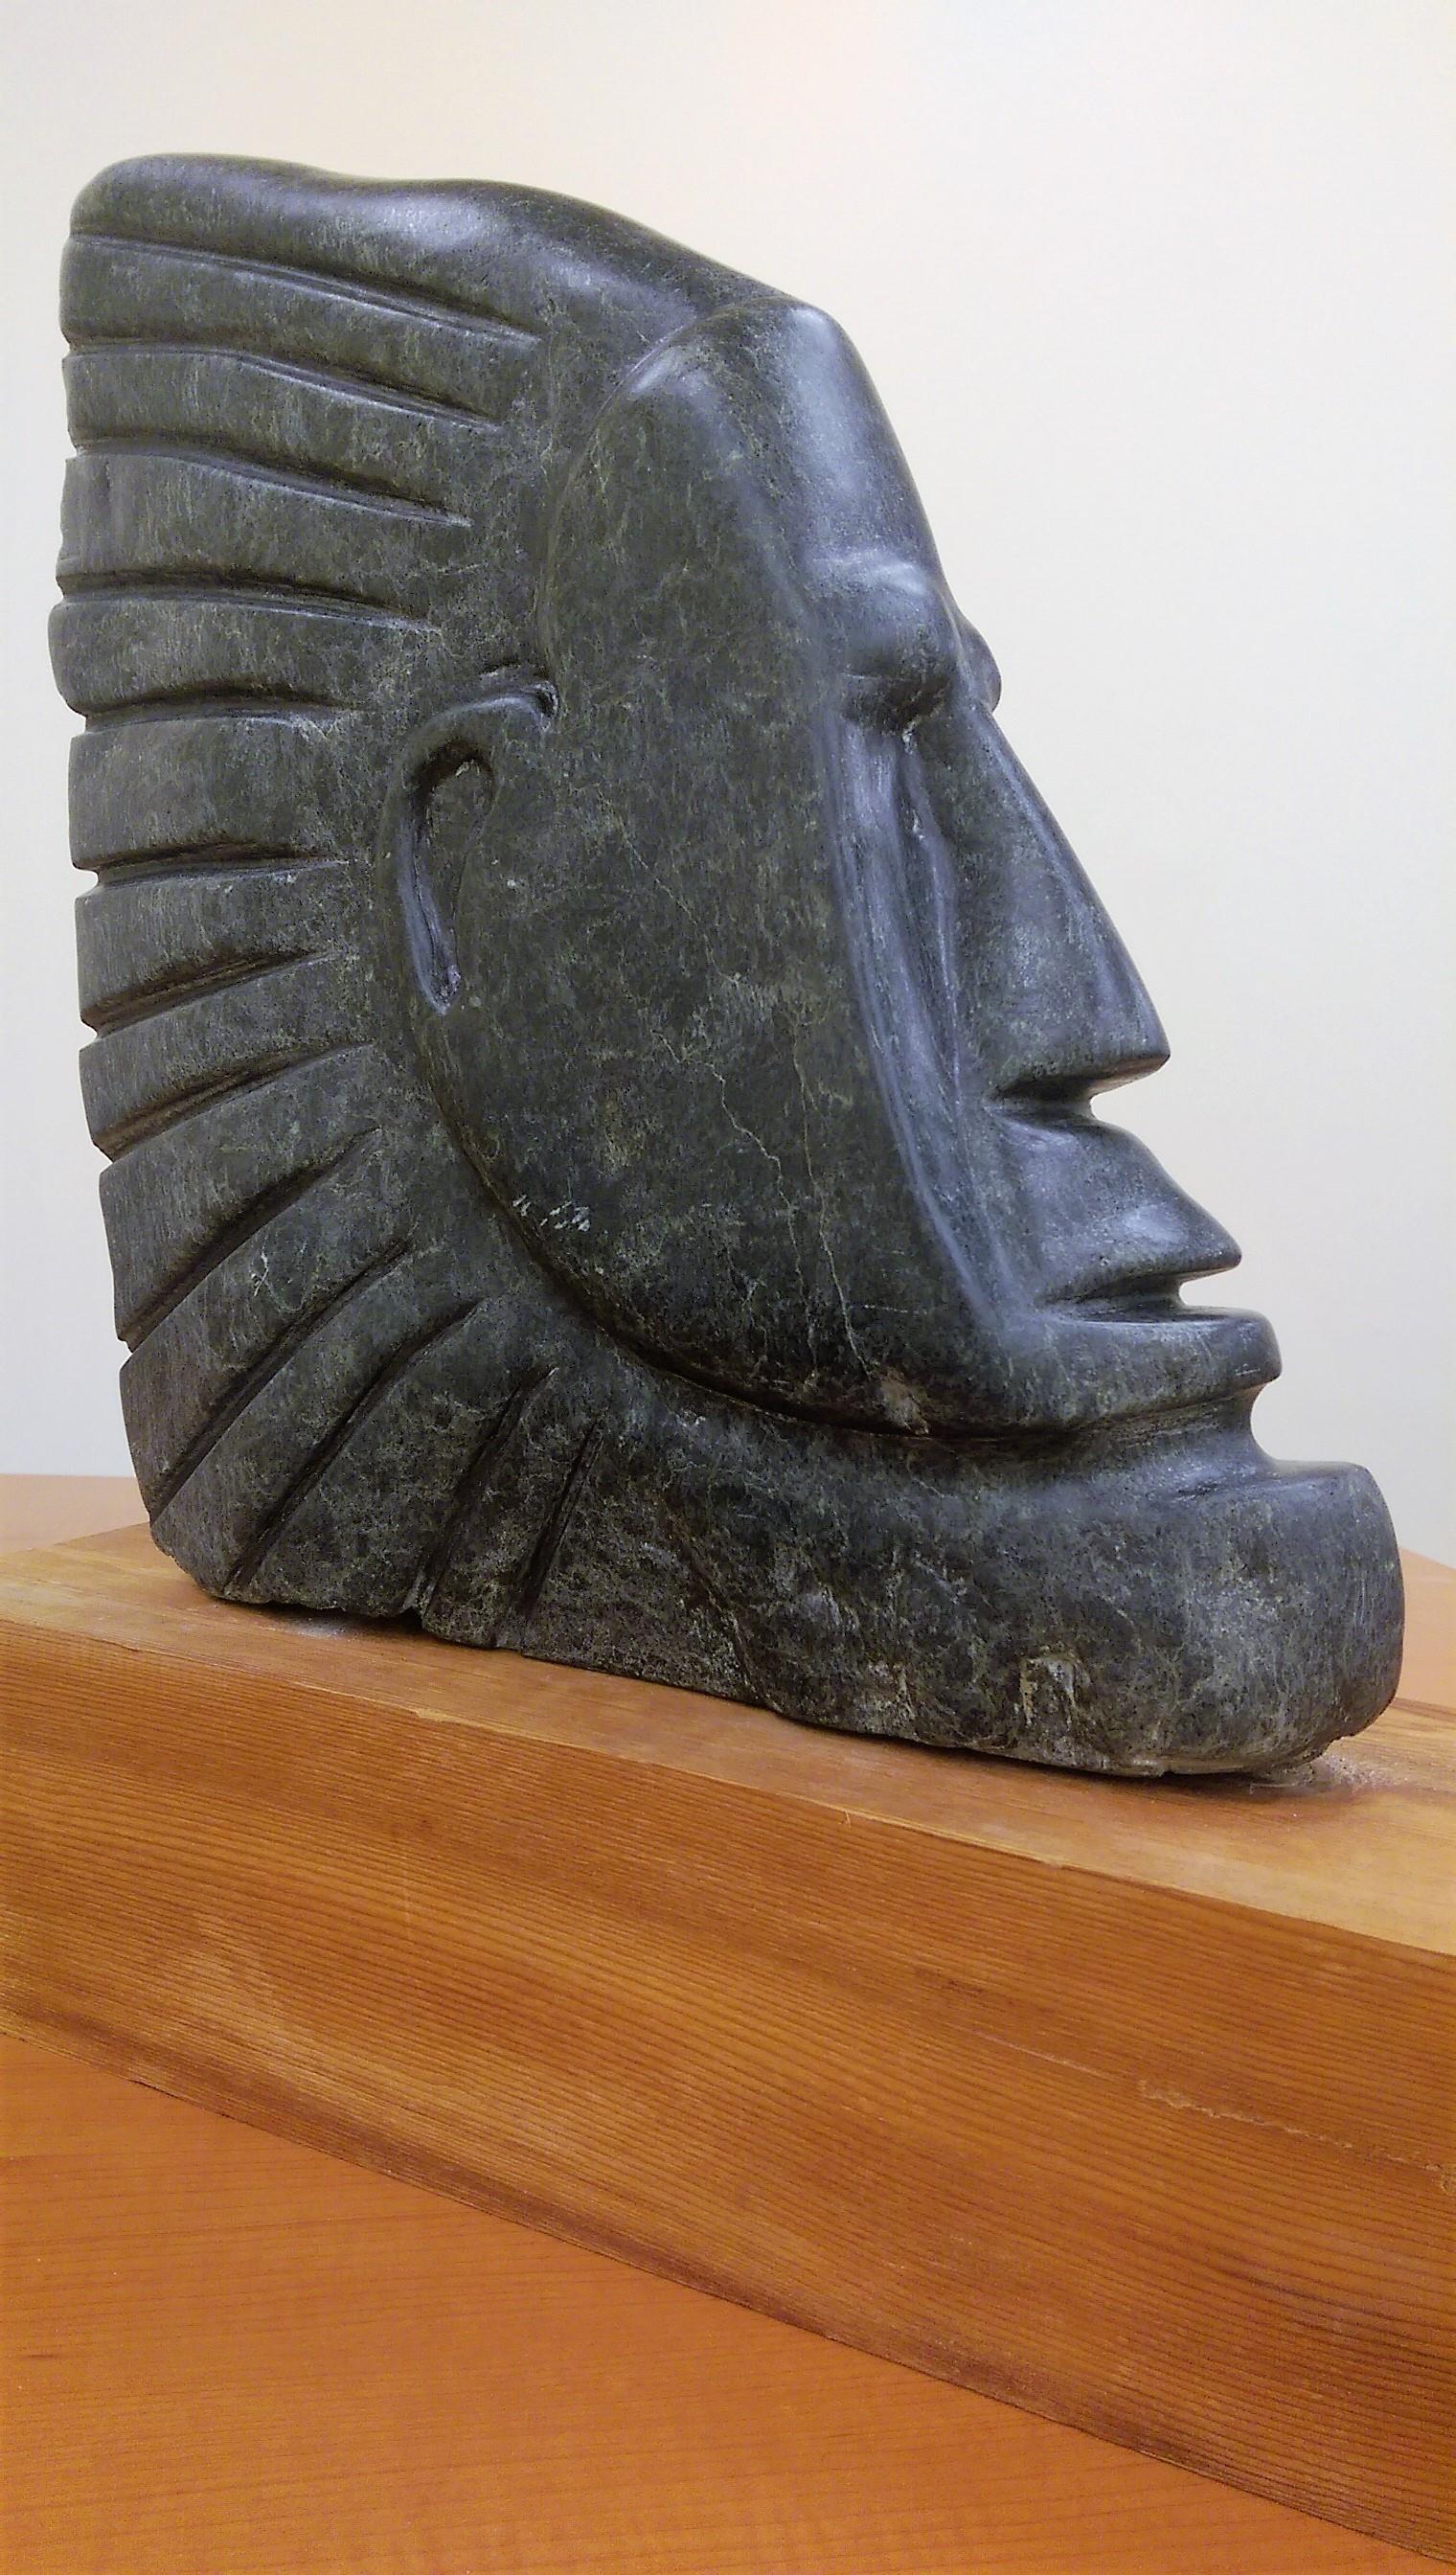 Soapstone sculpture by Alan Rhody